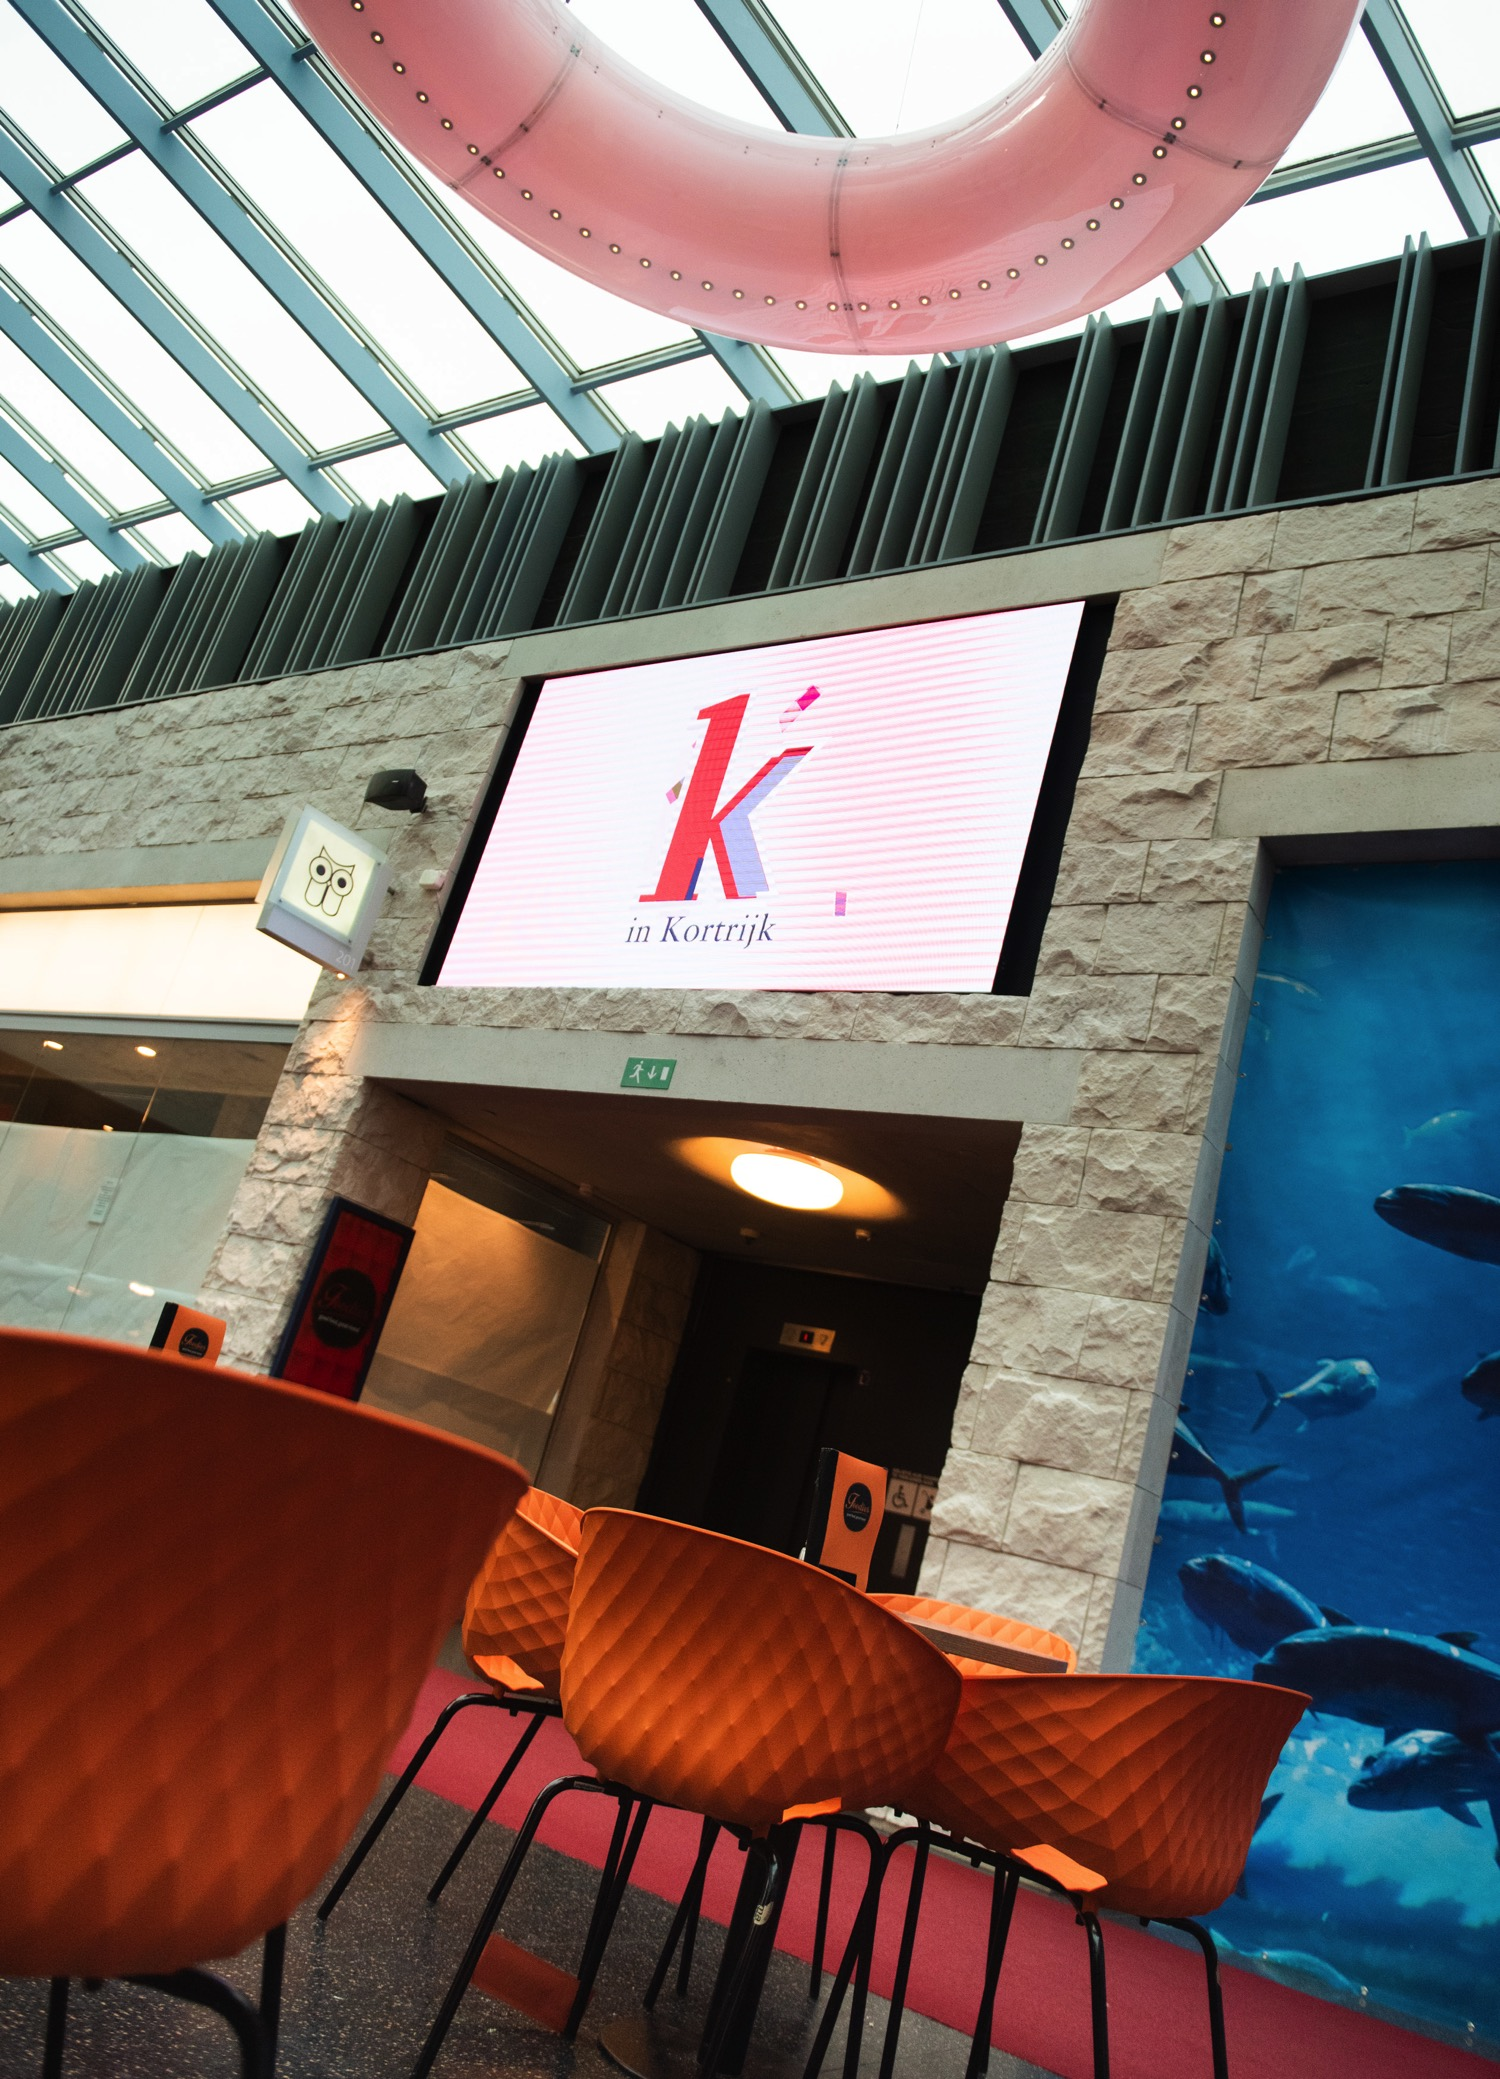 K in Kortrijk LED scherm